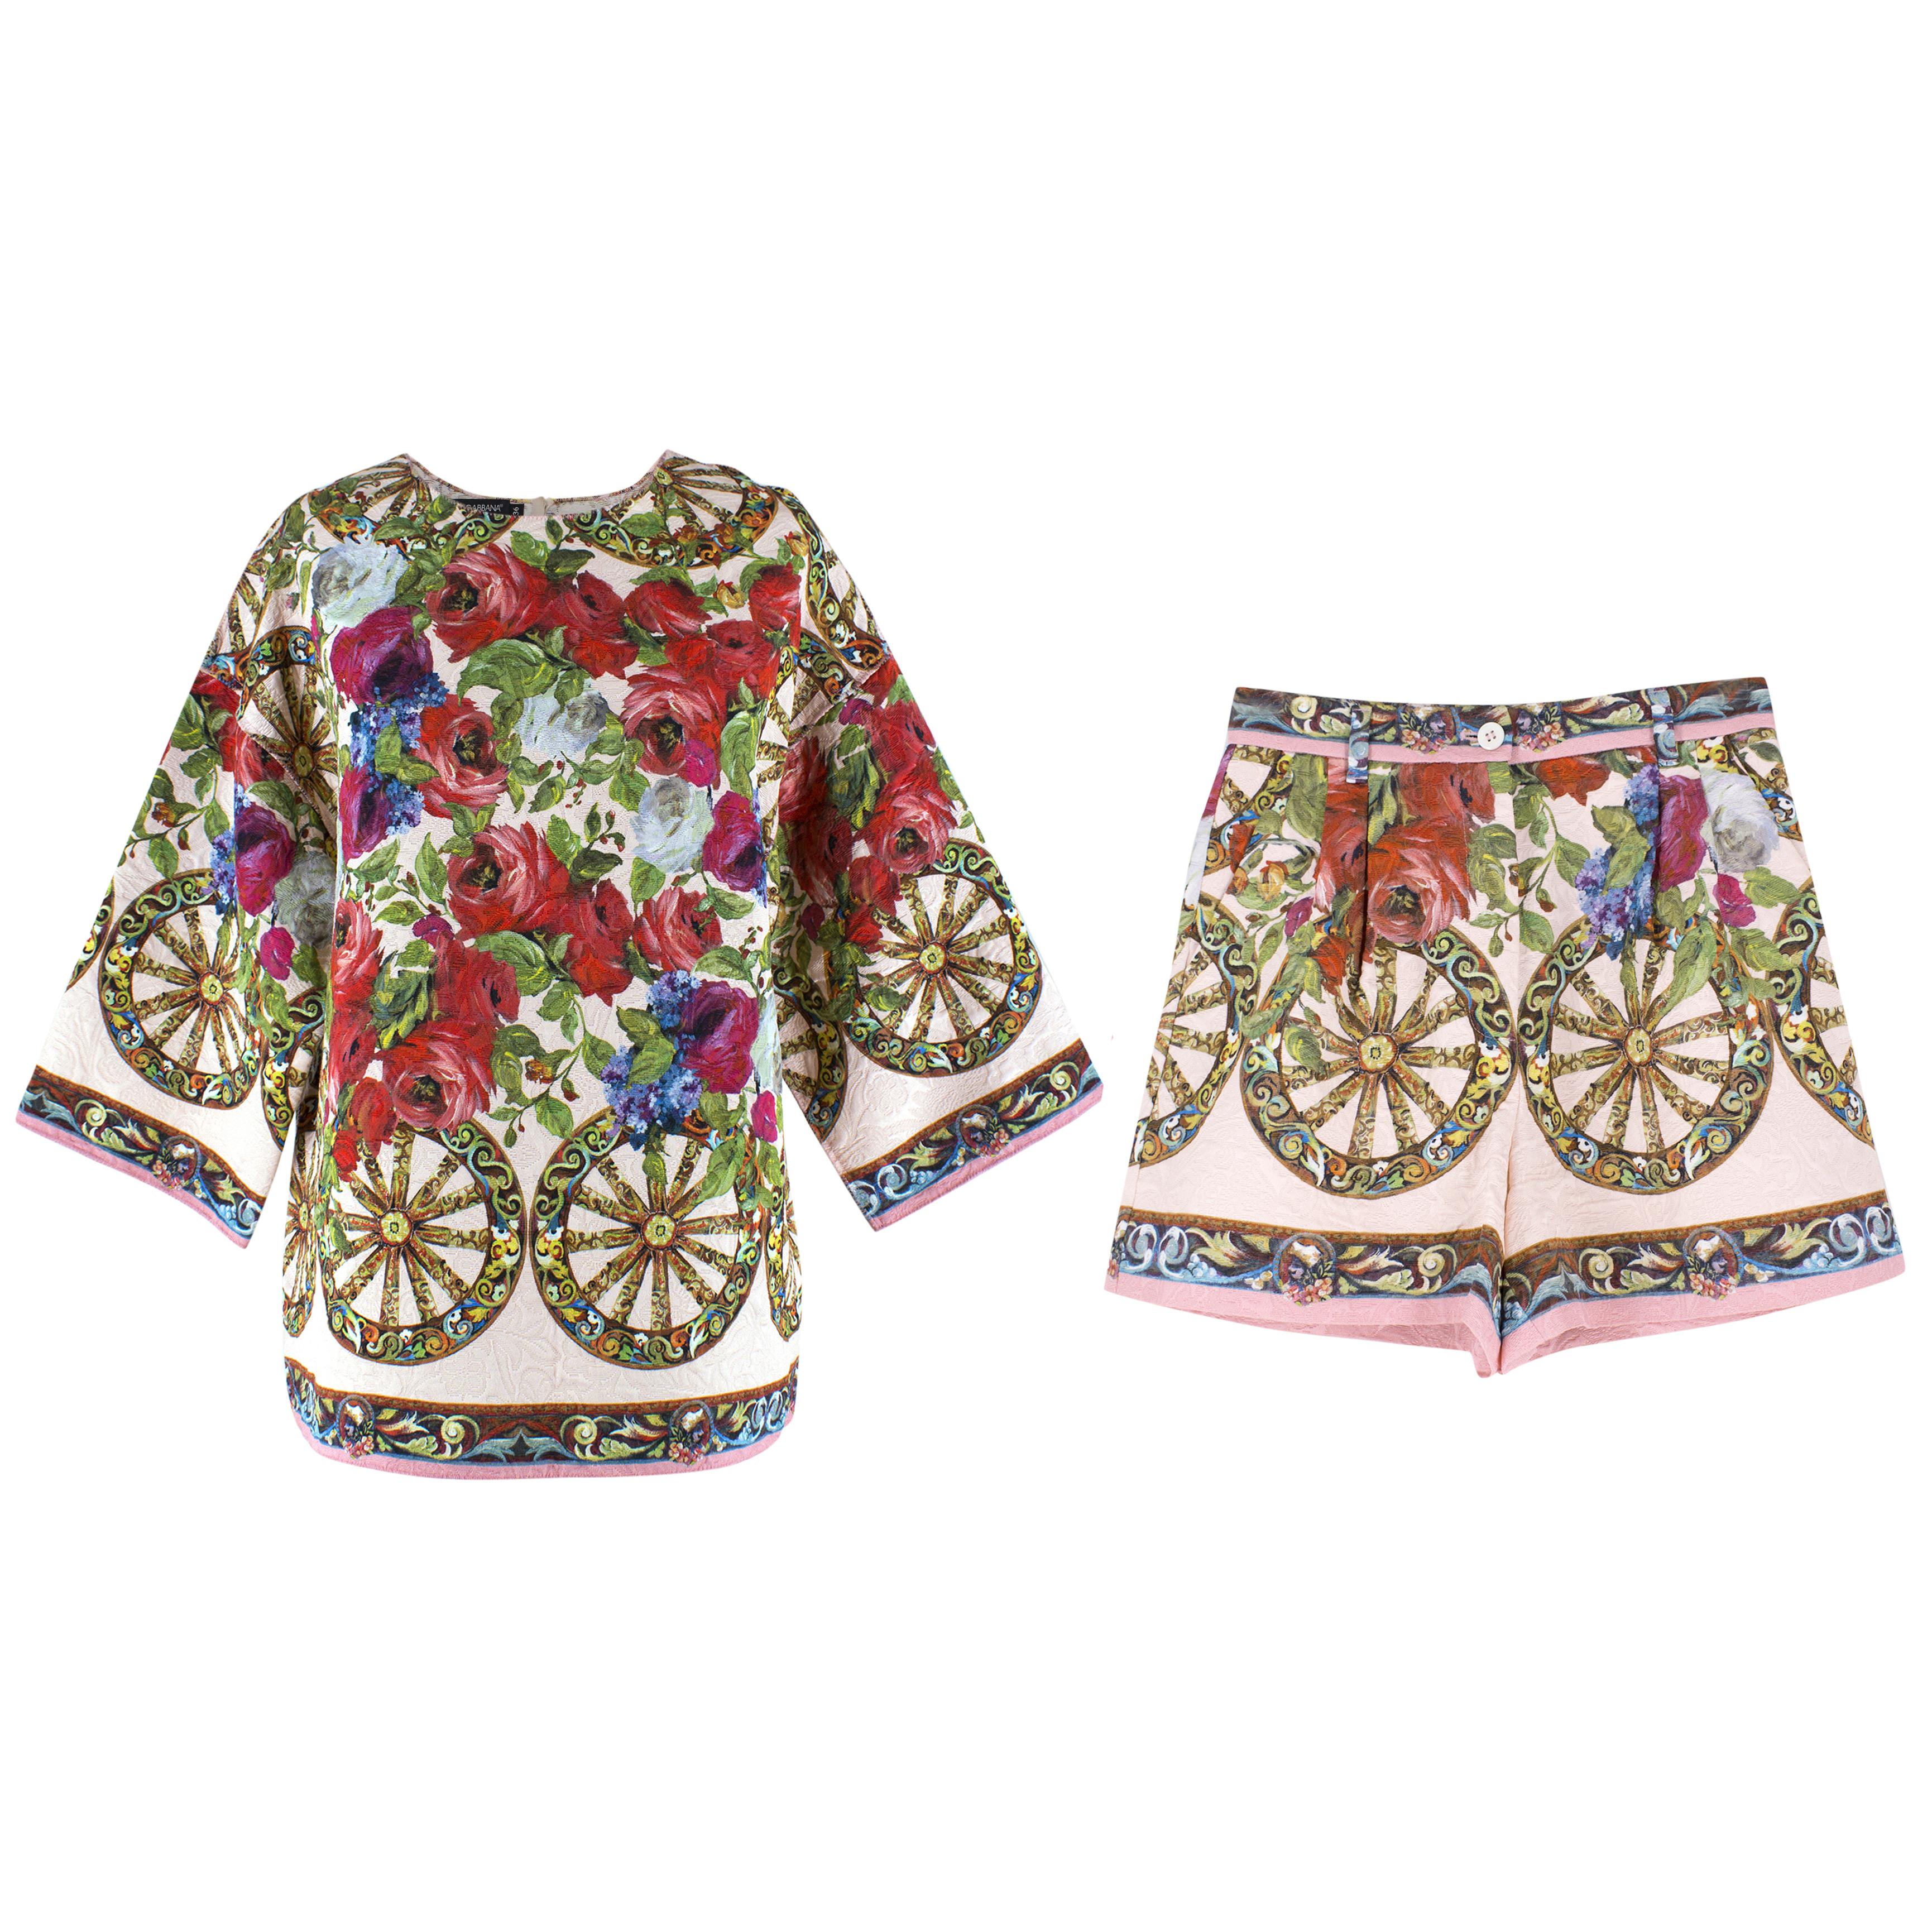 Dolce & Gabbana Rose Jacquard Set